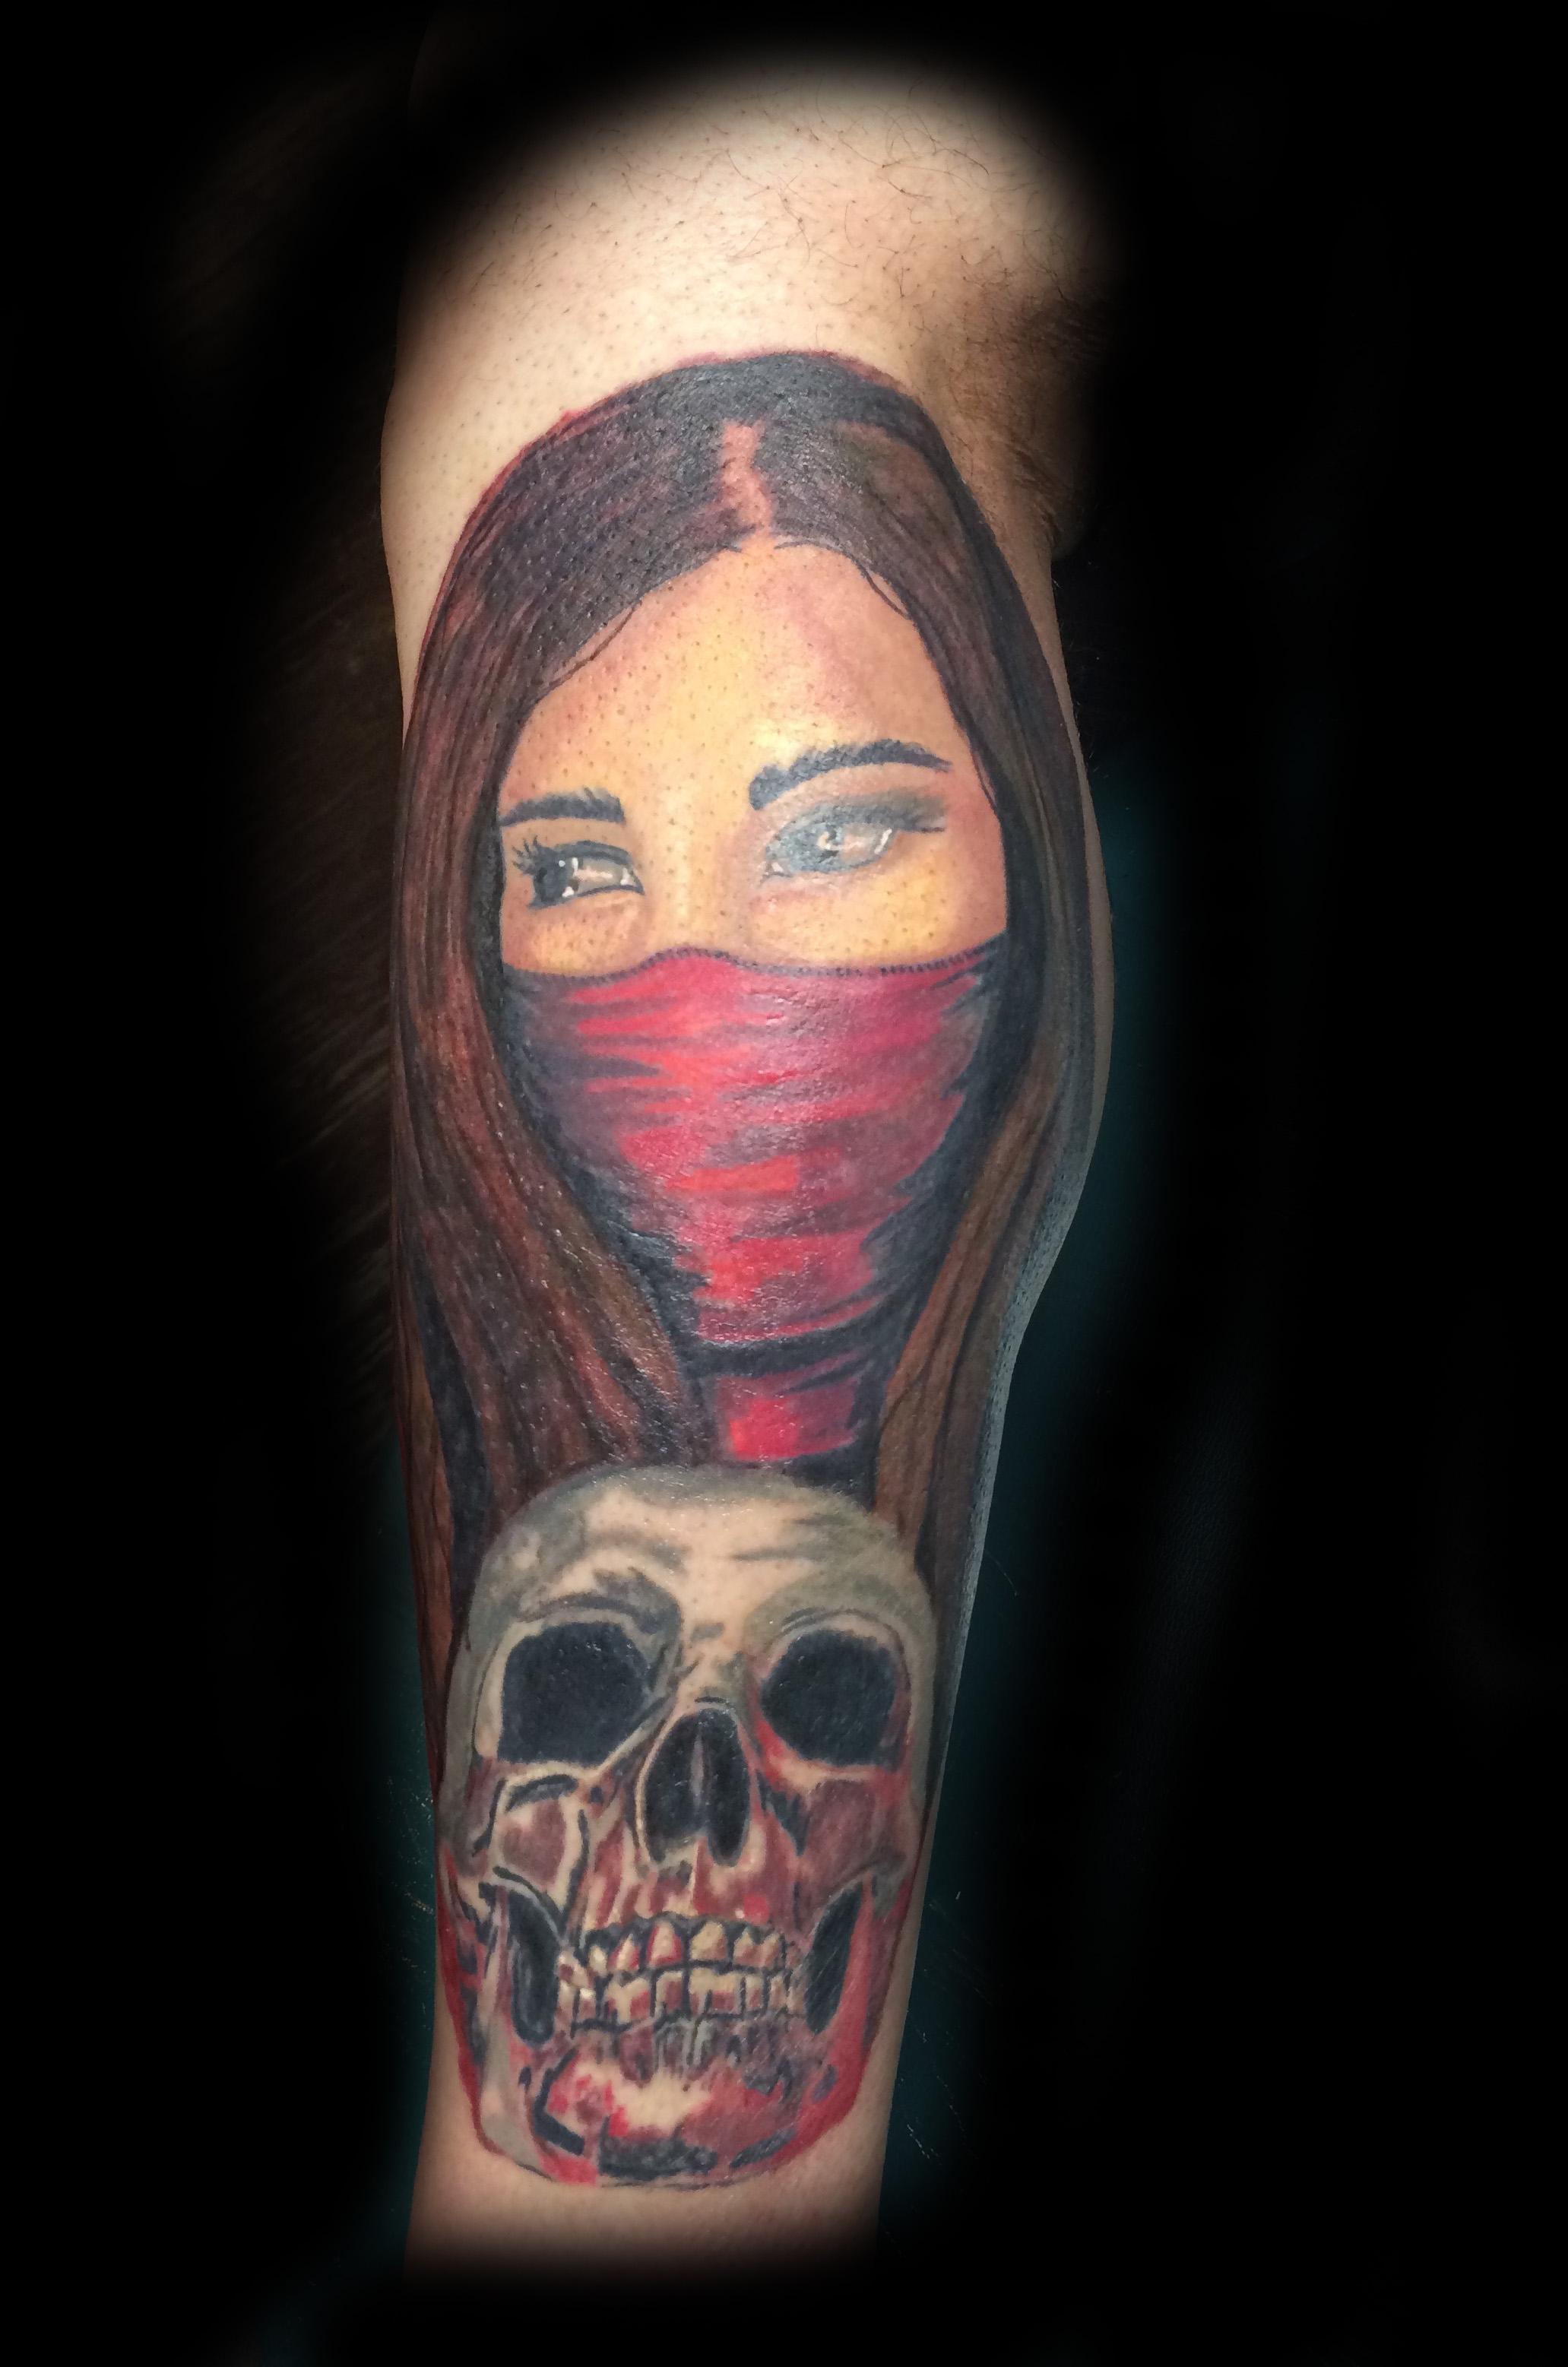 Skull and Woman Tattoo